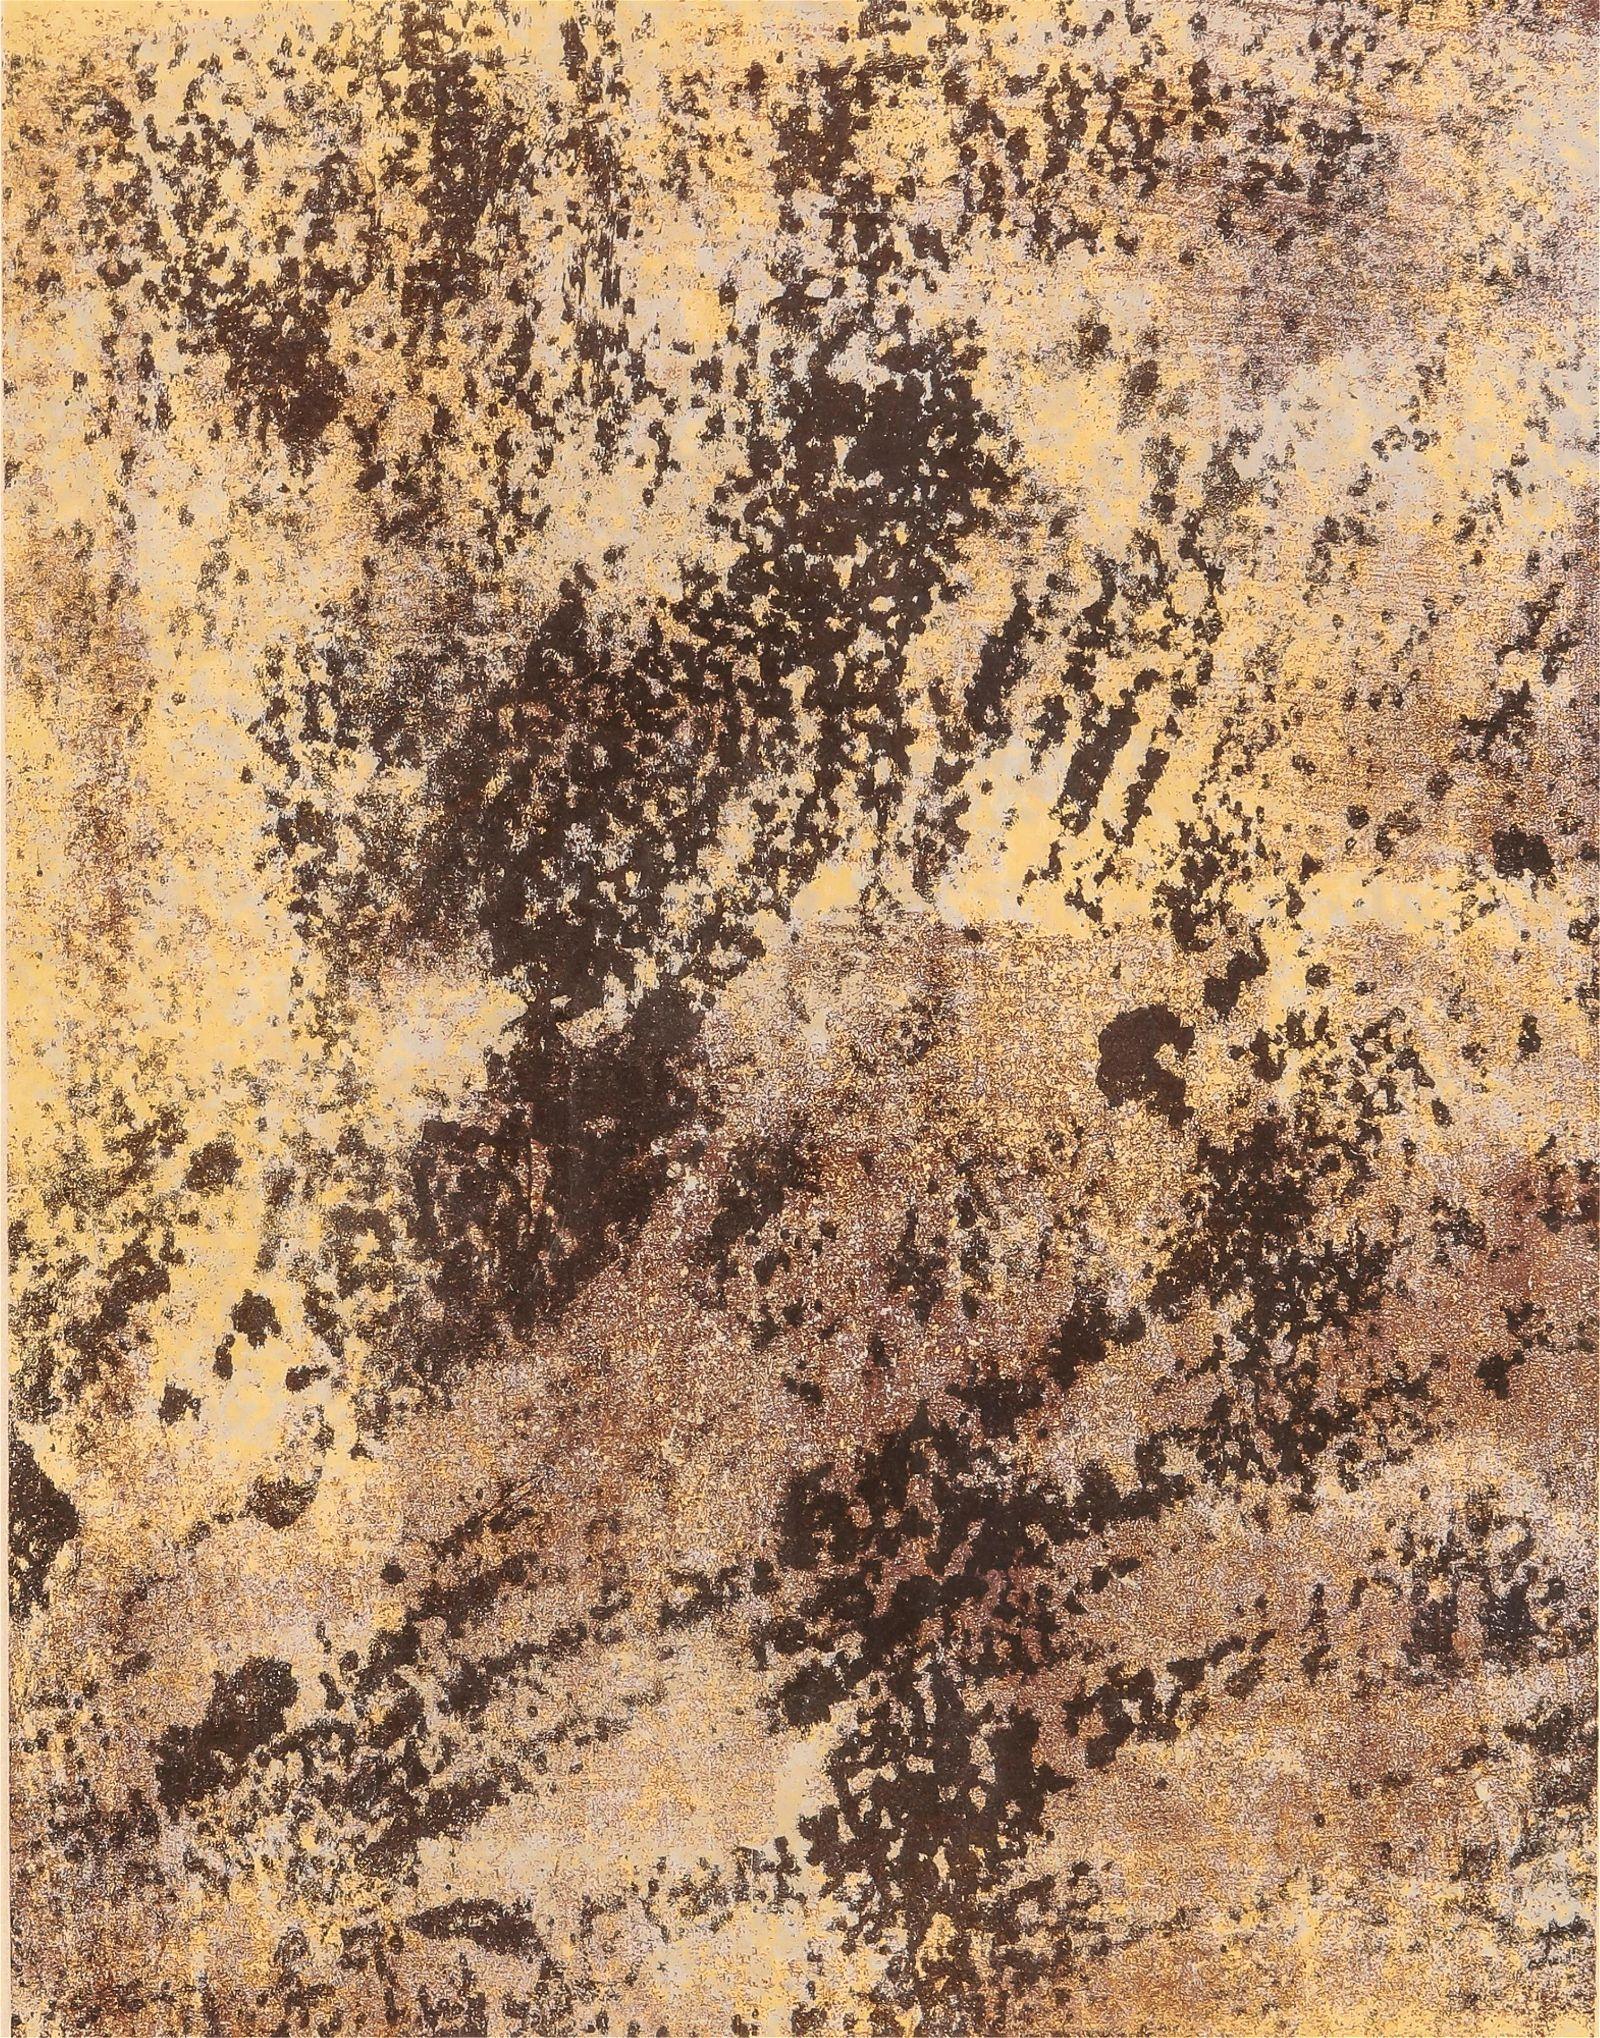 Jean Dubuffet, Le sol allegre, 1958, lithograph